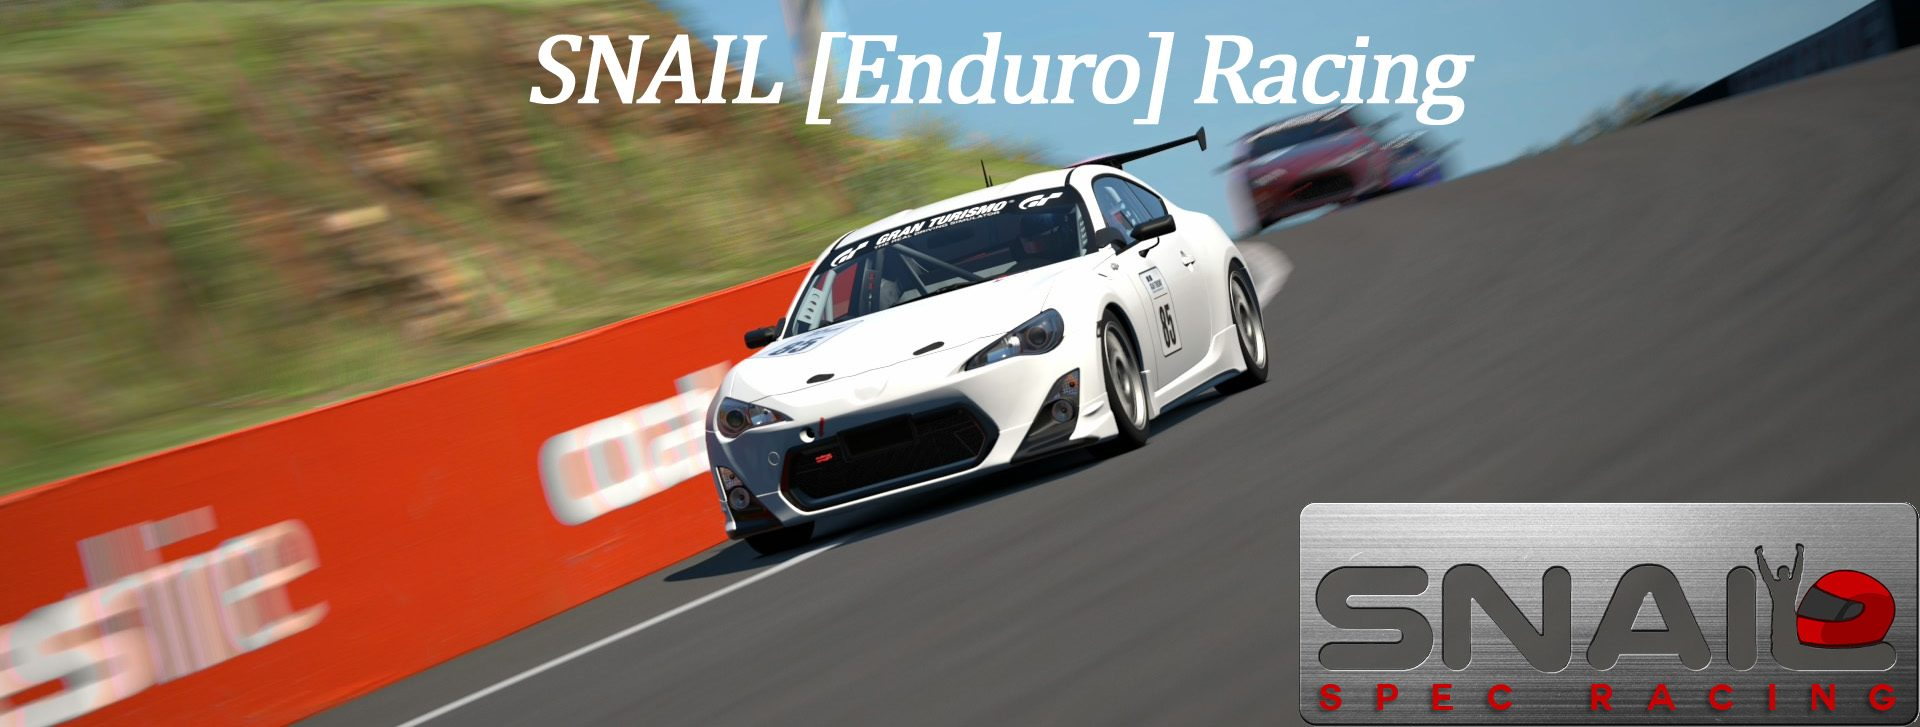 SNAIL[Enduro]Racing Logo copy.jpg